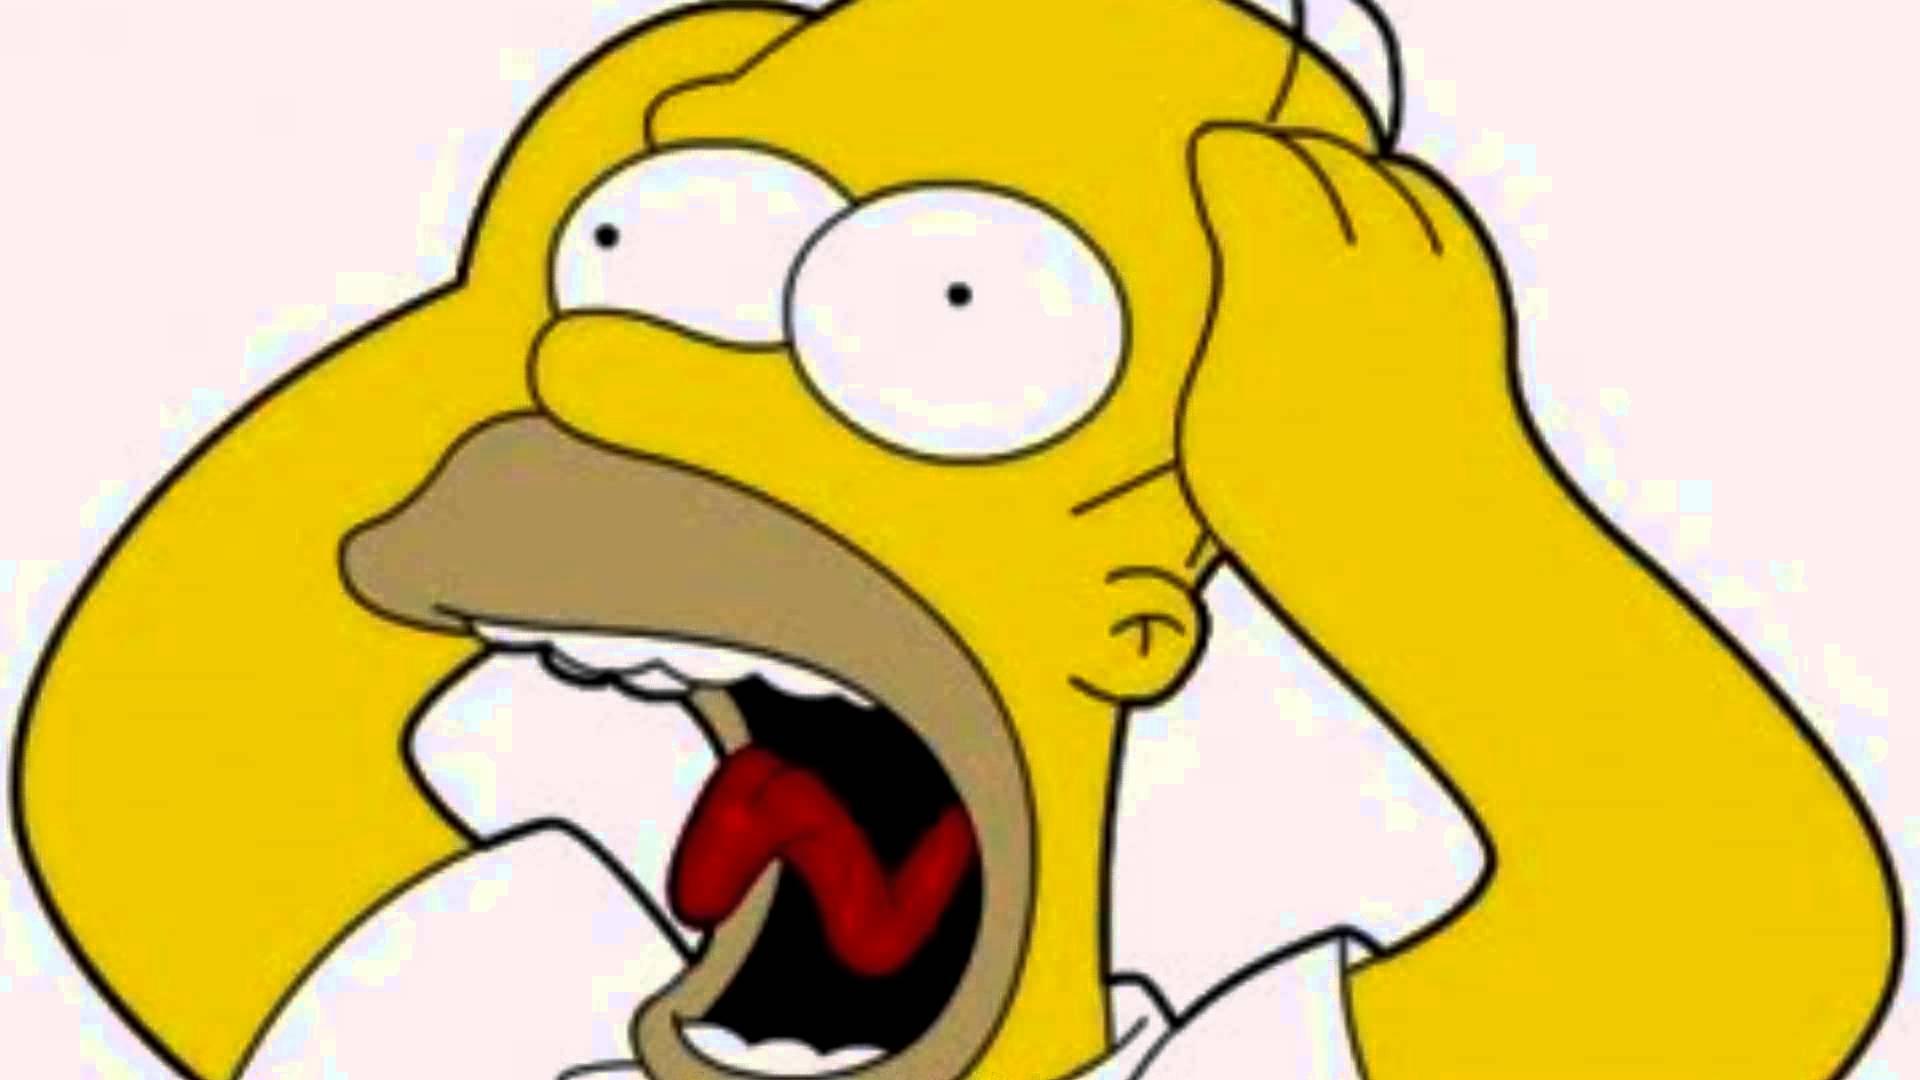 Screaming clipart don t Scream  Homer YouTube